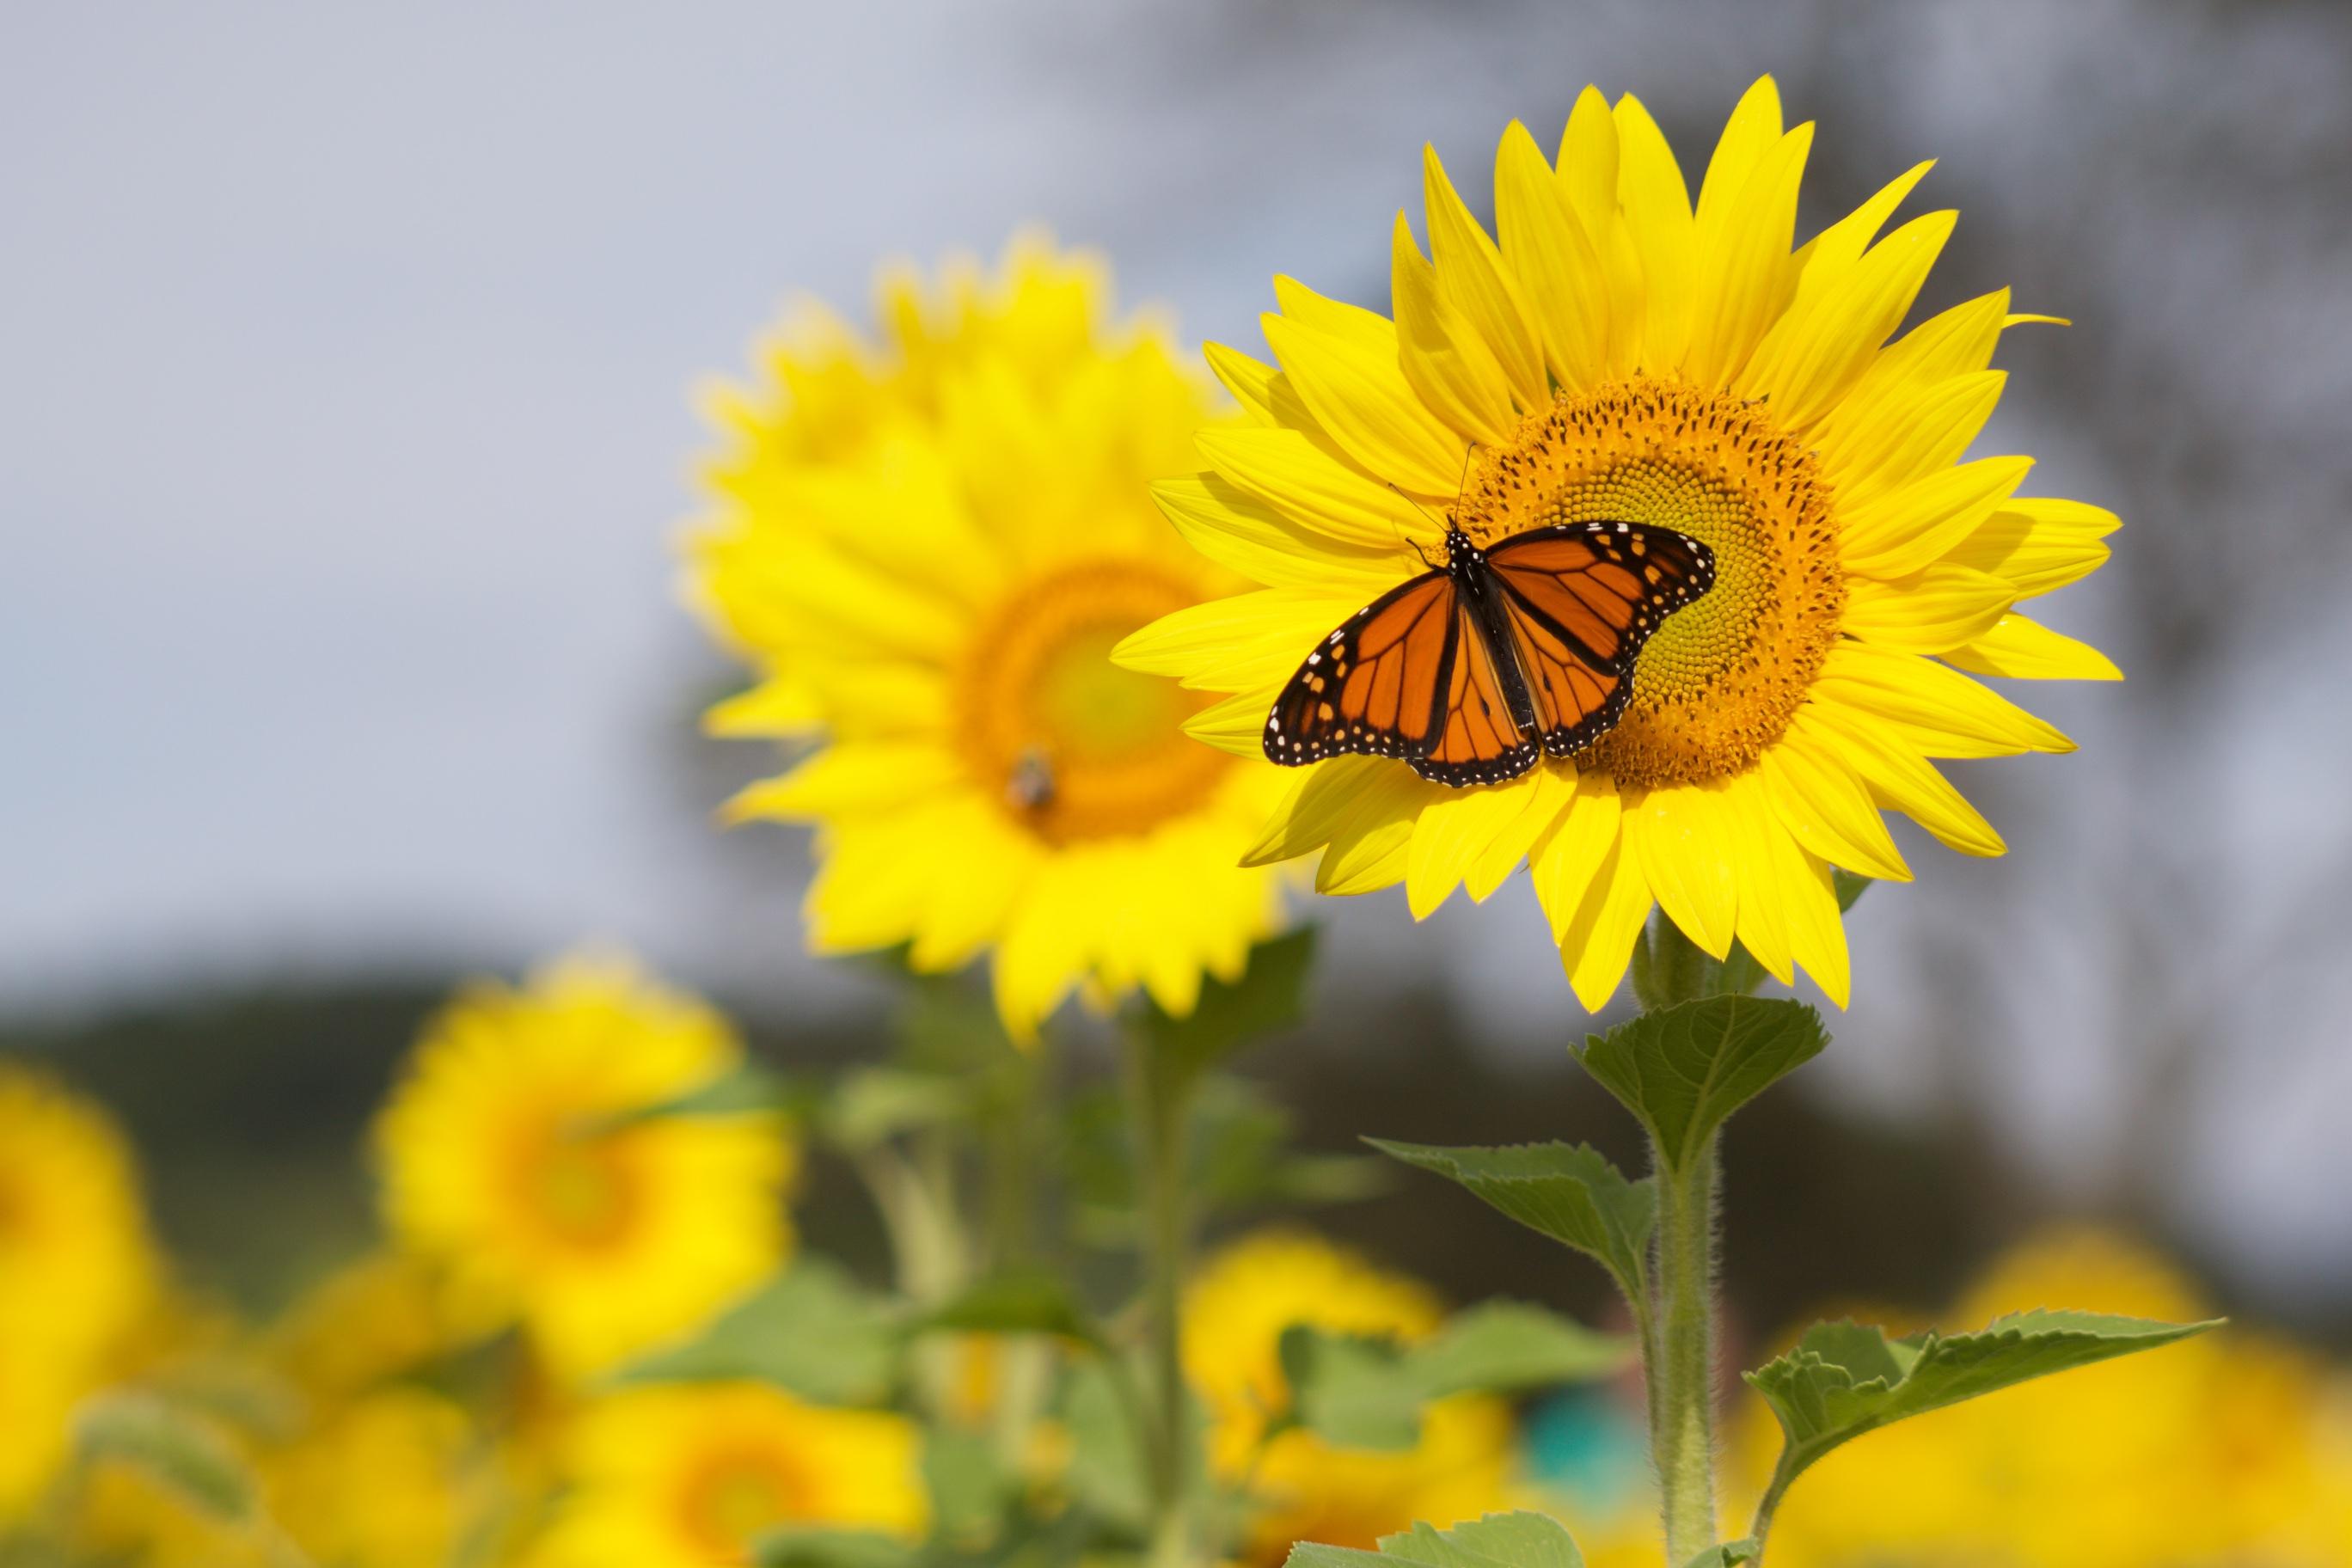 Butterfly on sunflower.